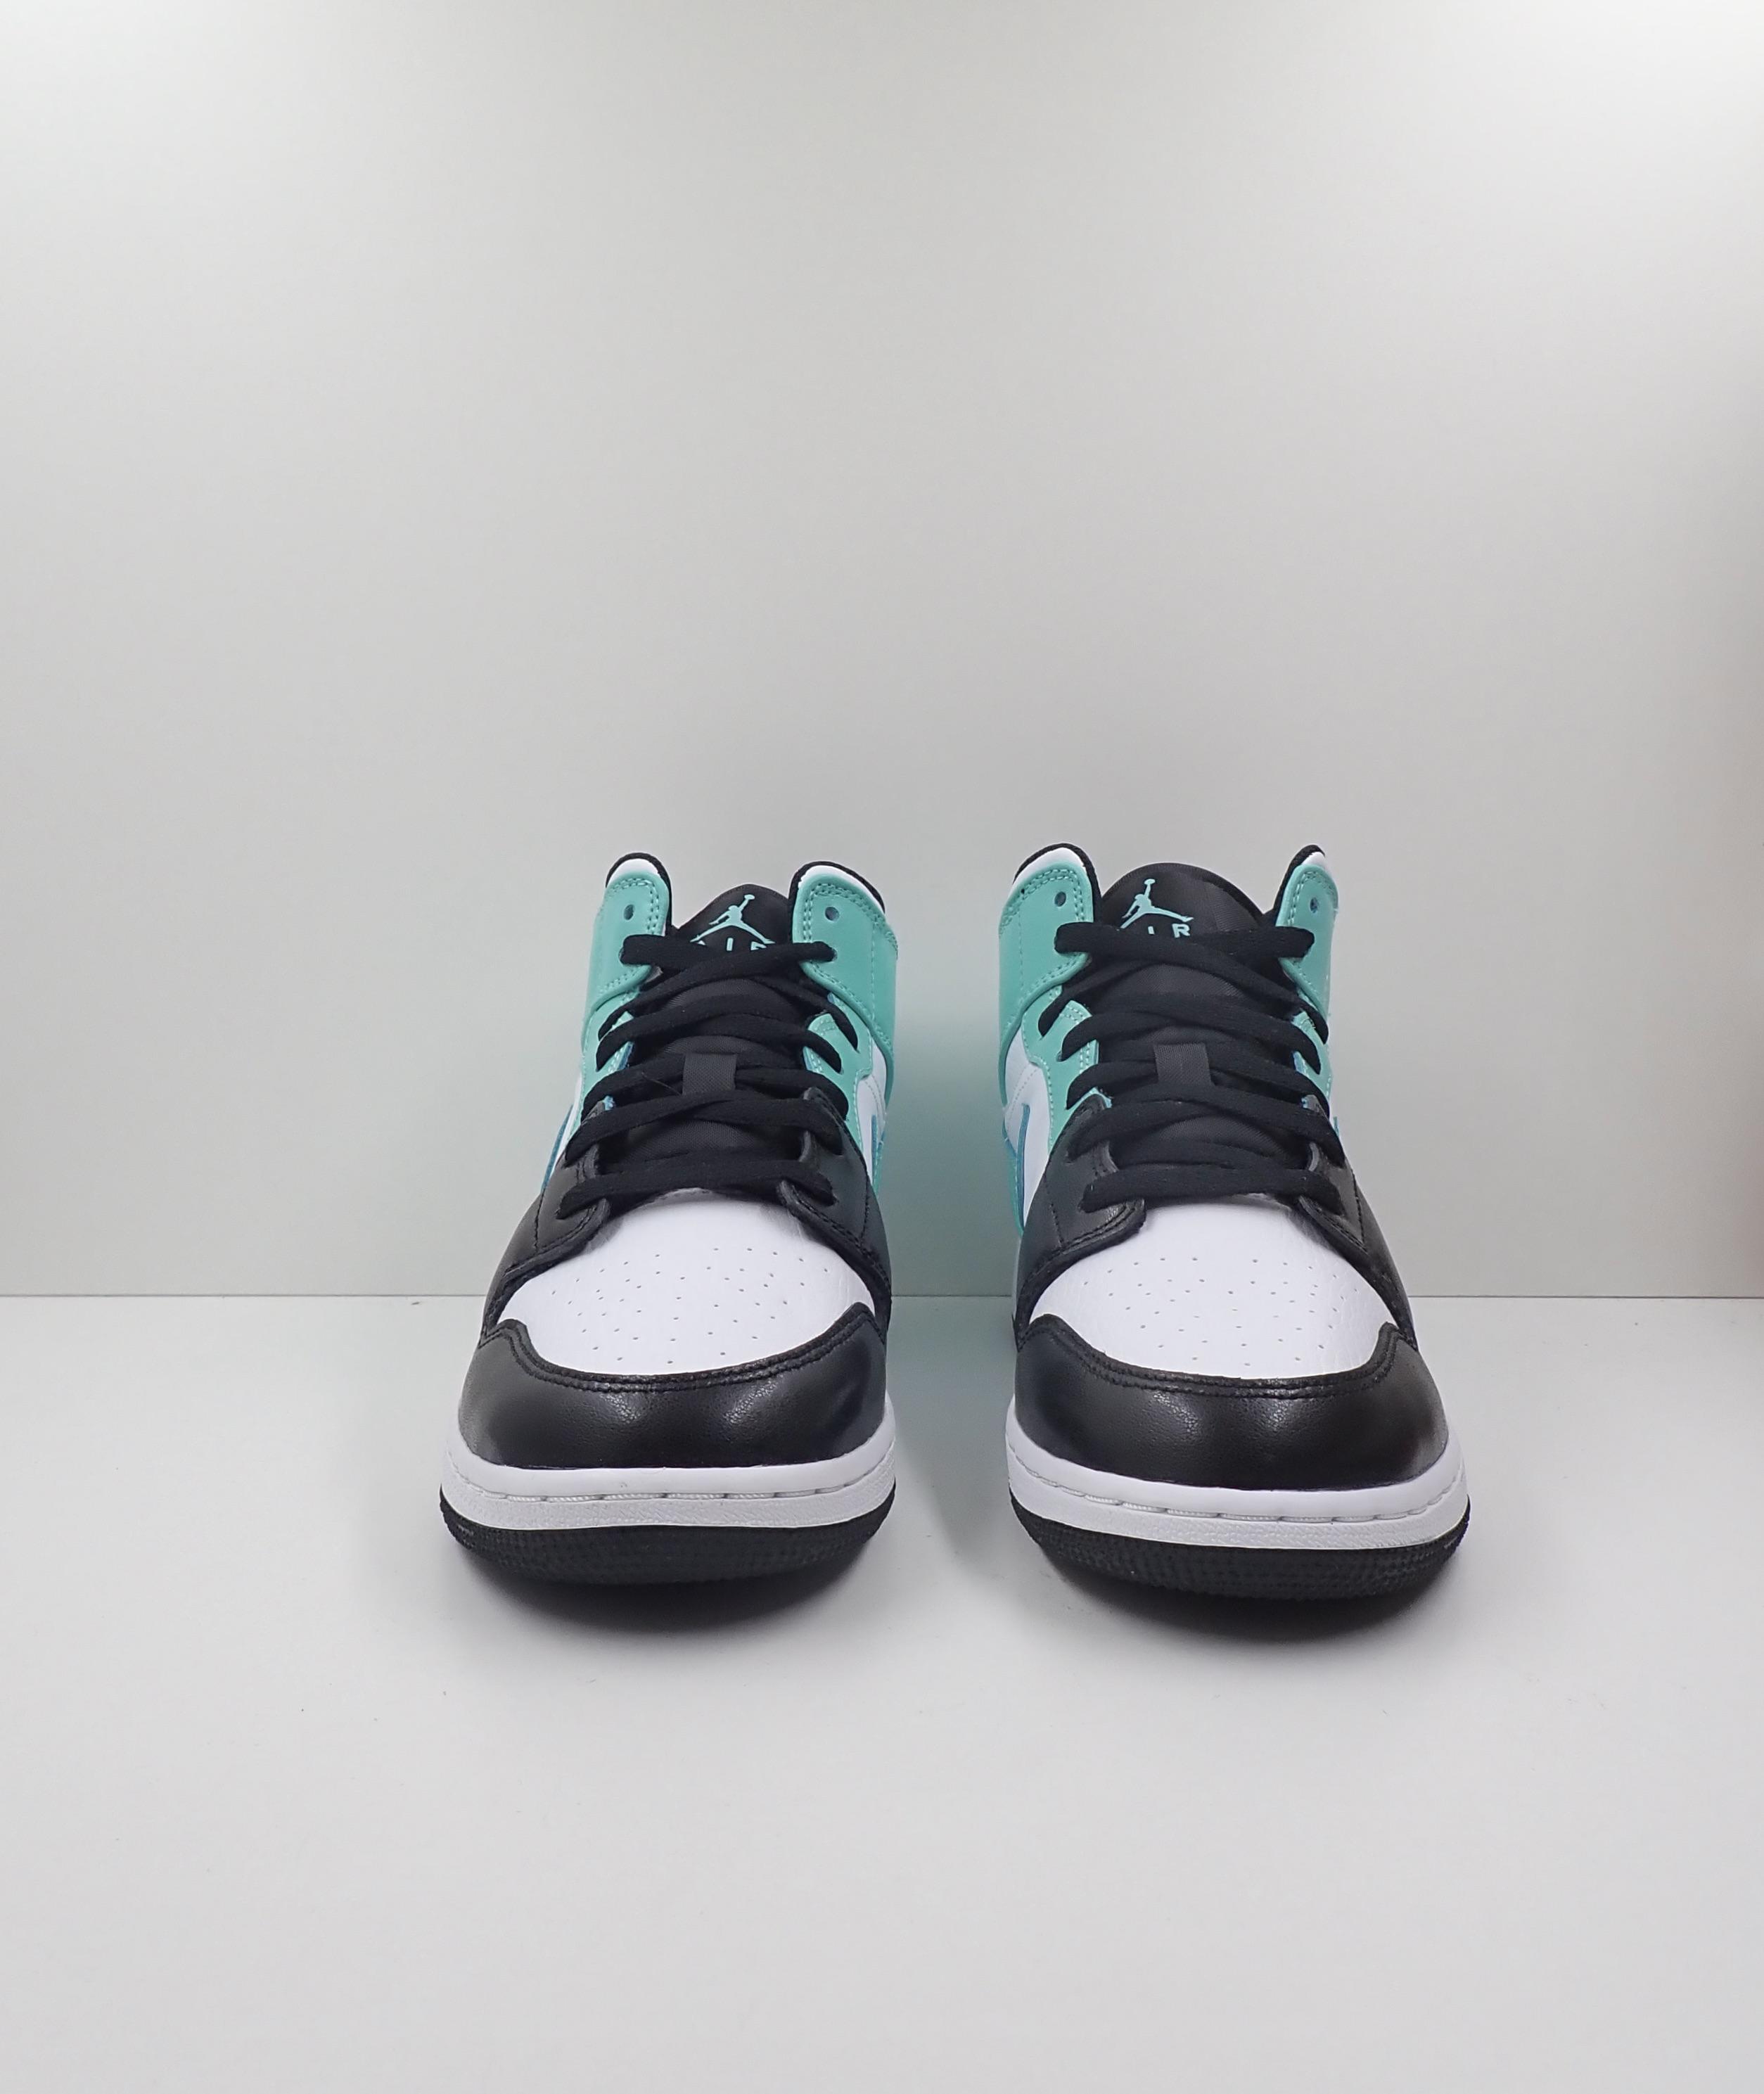 Jordan 1 Mid Igloo (GS)